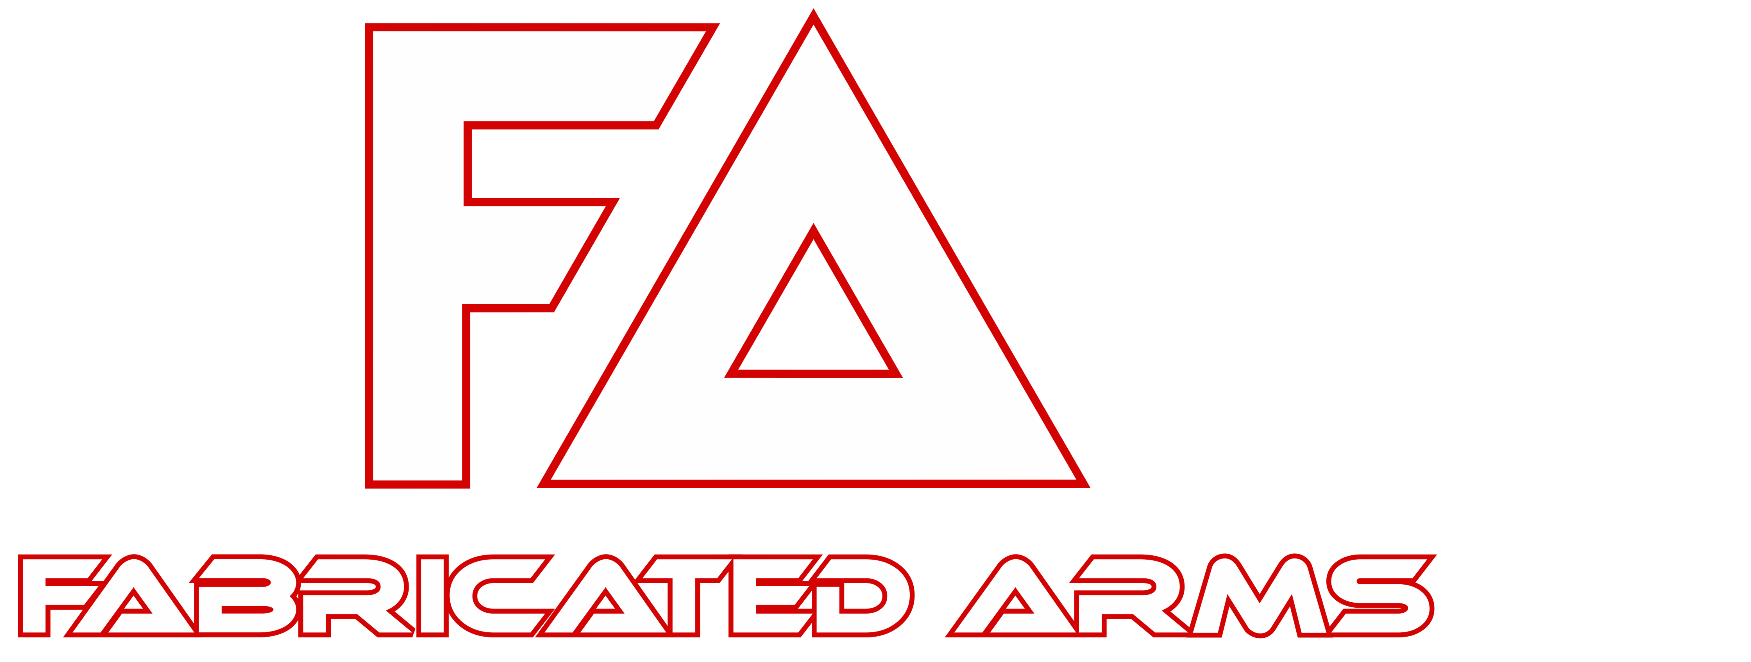 Fabricated Arms LLC